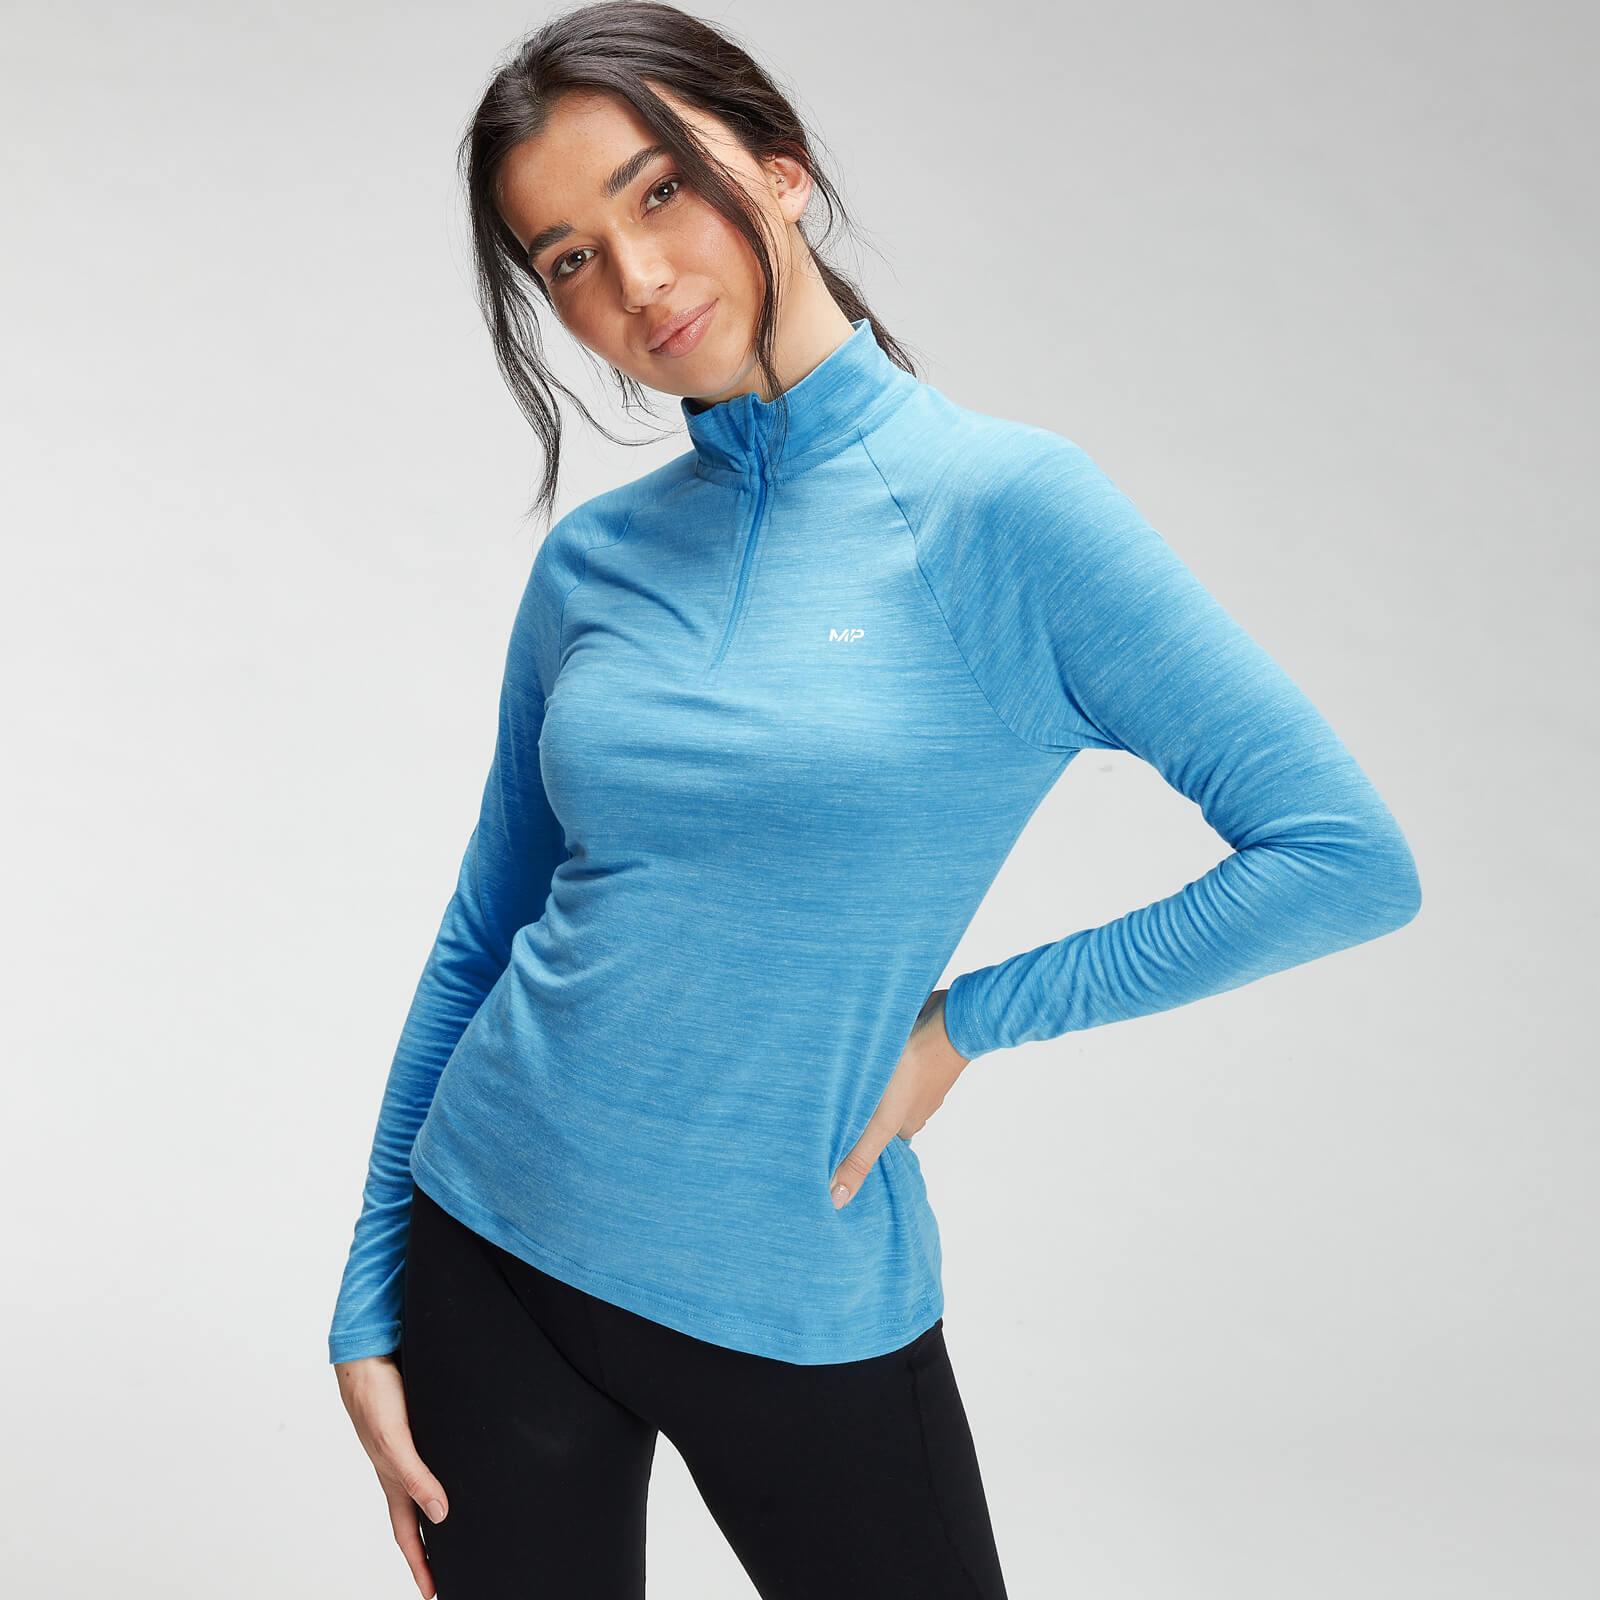 Купить MP Women's Performance Training 1/4 Zip Top - Bright Blue Marl with White Fleck - XXS, Myprotein International